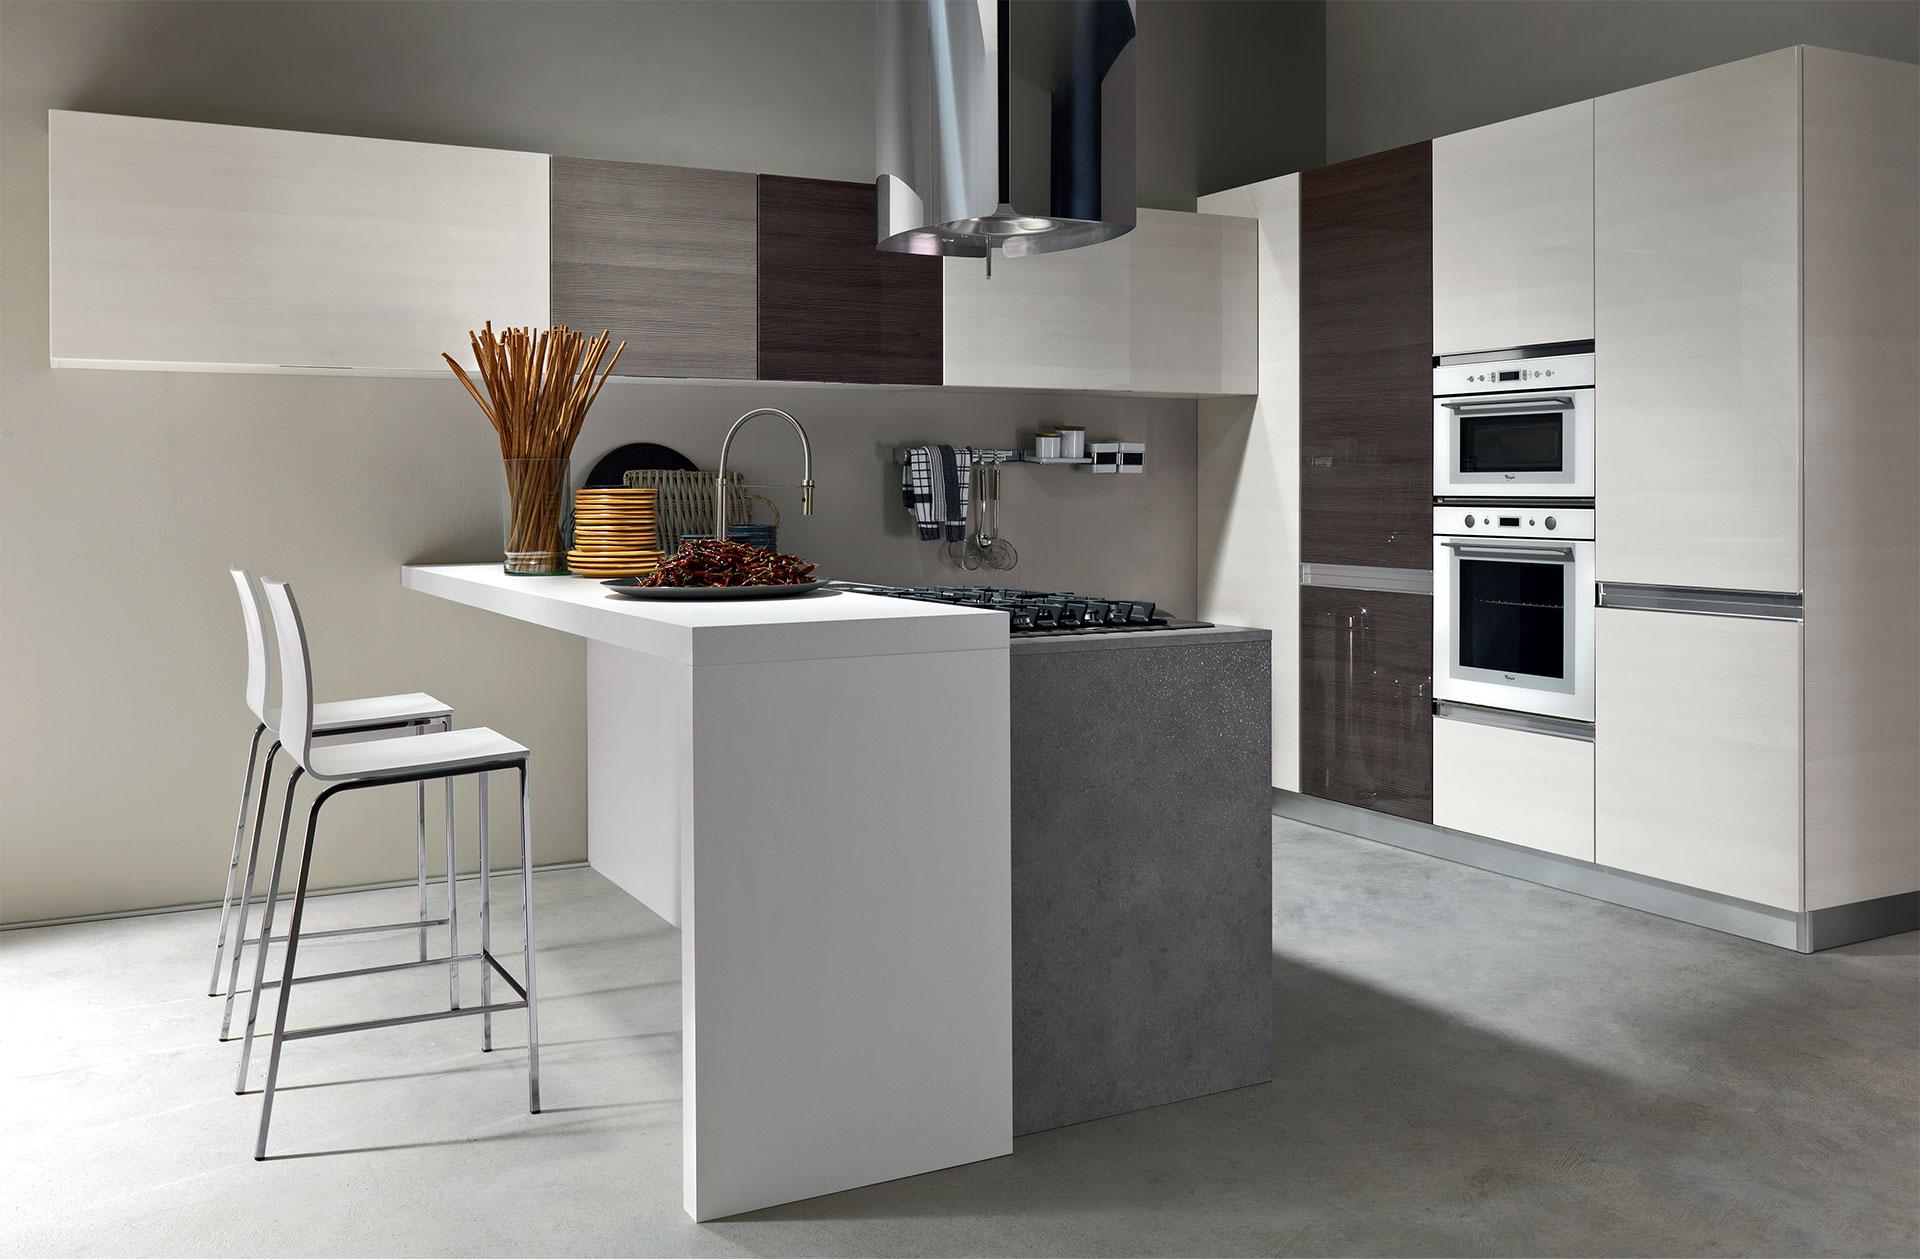 Cucina vela cucine moderne astra for Cucine moderne